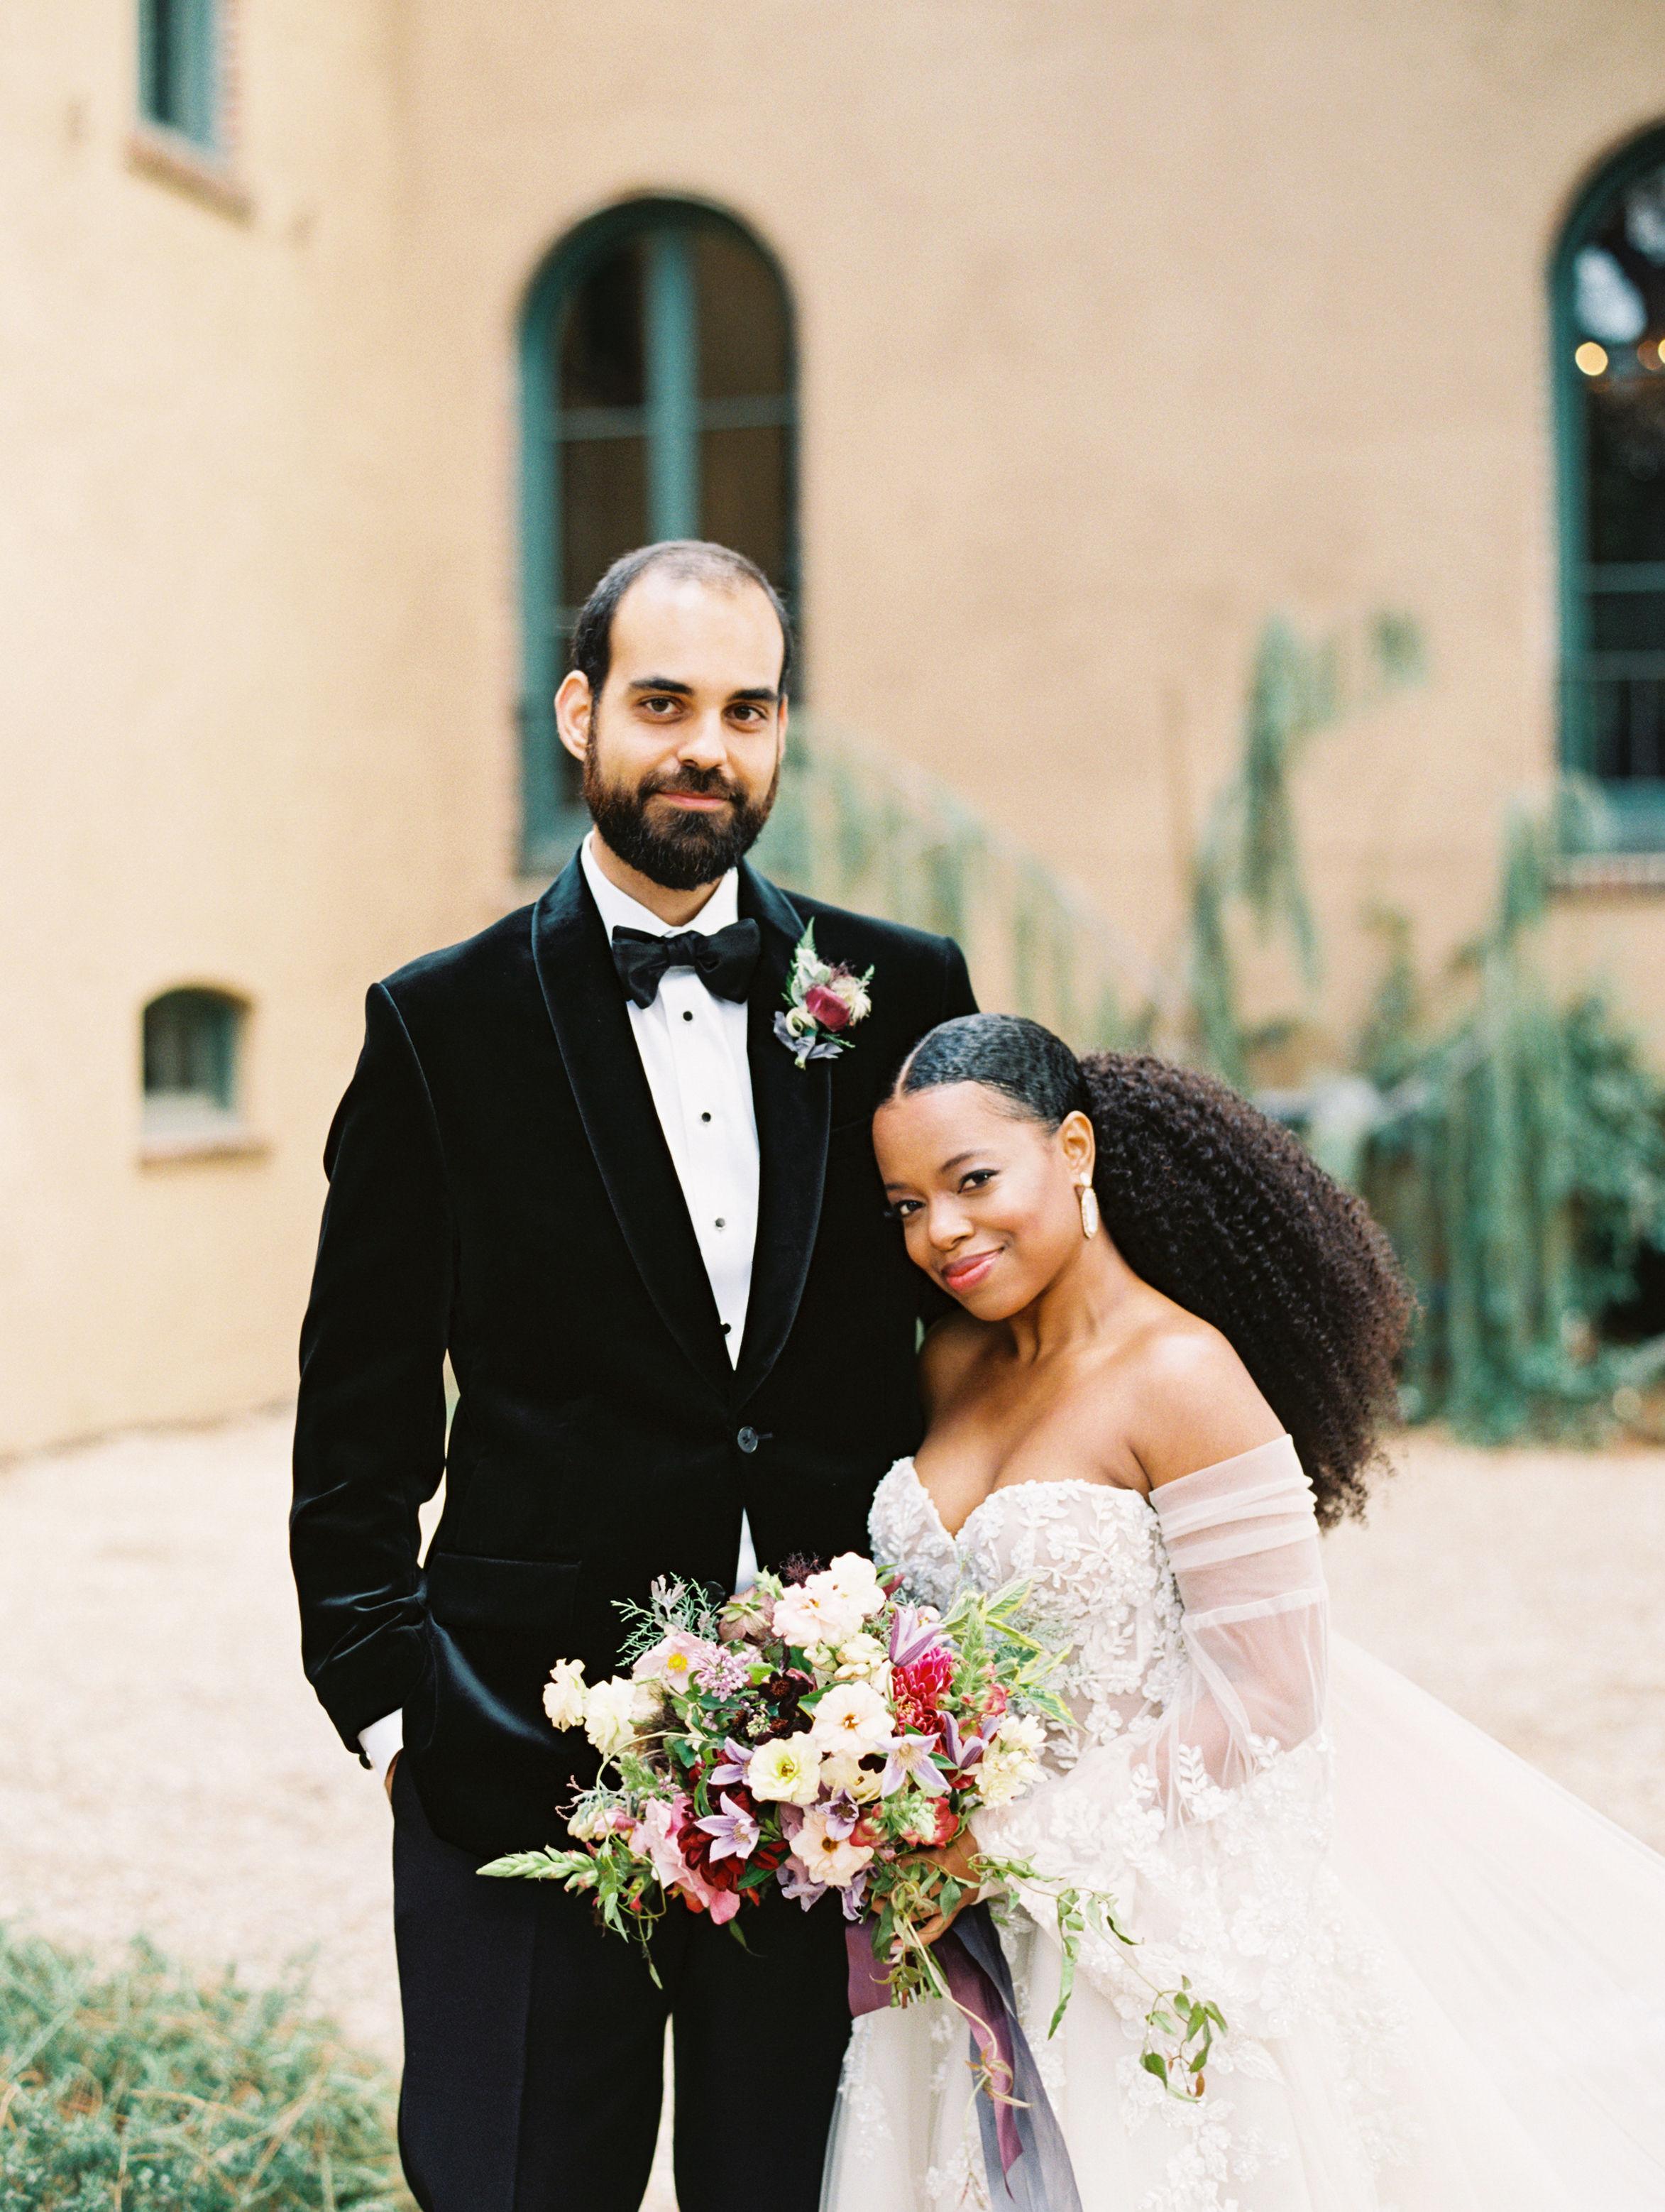 An Edgy Garden Wedding in Los Angeles